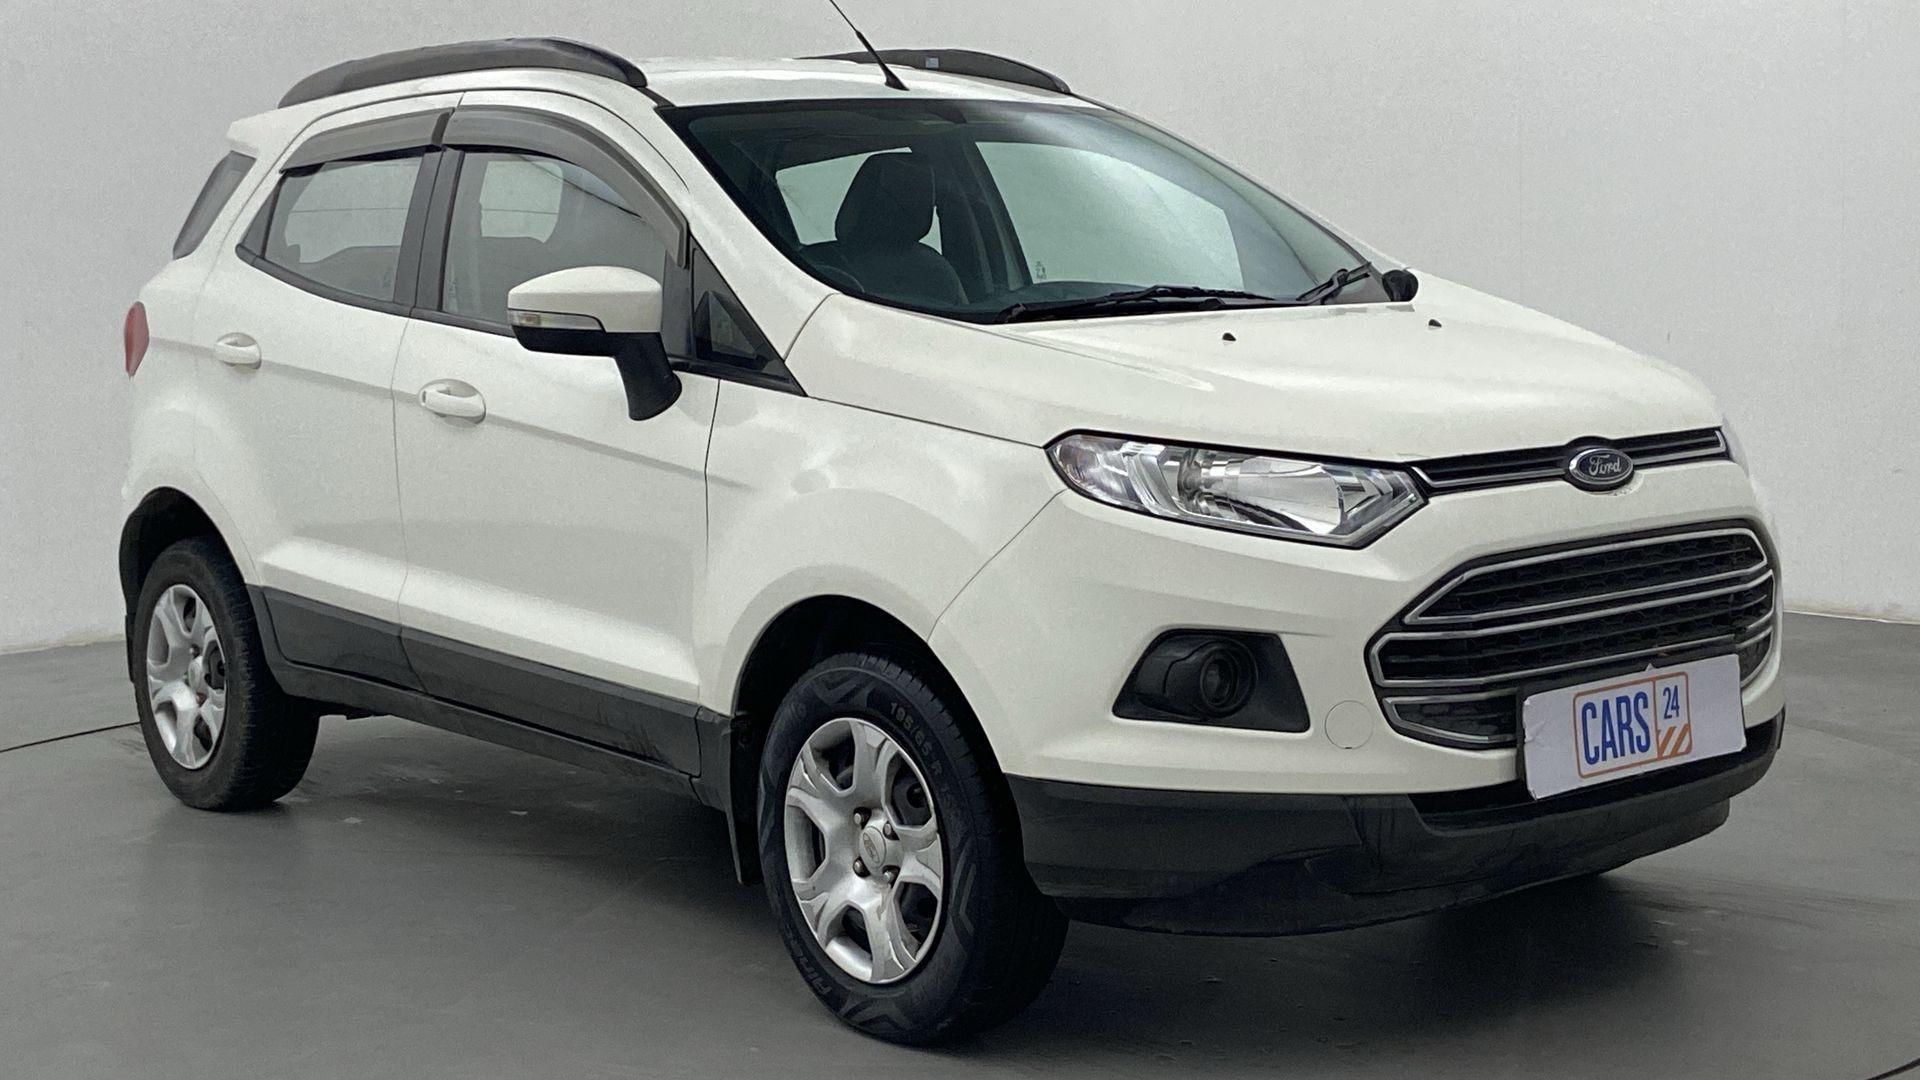 2015 Ford Ecosport 1.5 AMBIENTE TDCI